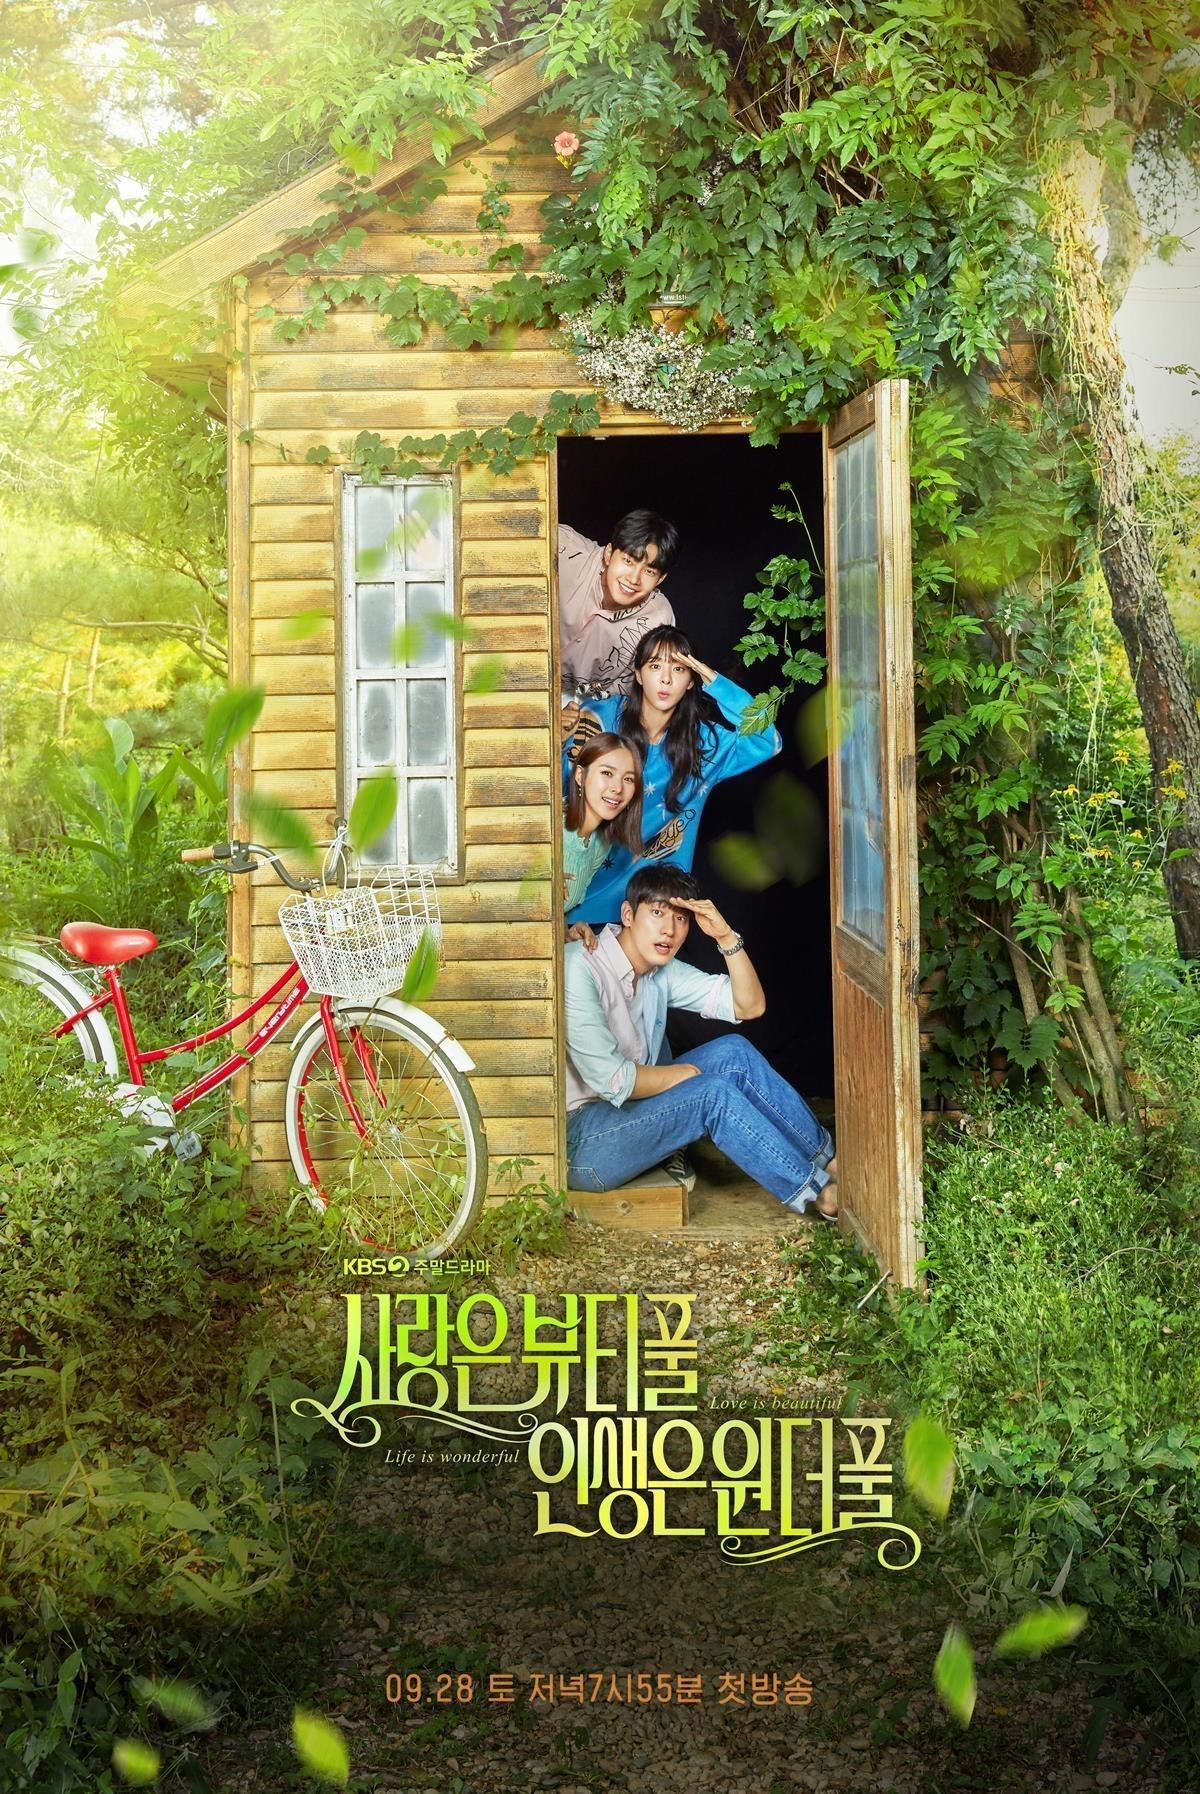 Beautiful Love, Wonderful Life (Sarangeun Byootipool Insaengeun Wondeopool / 사랑은 뷰티풀 인생은 원터풀) (2019)